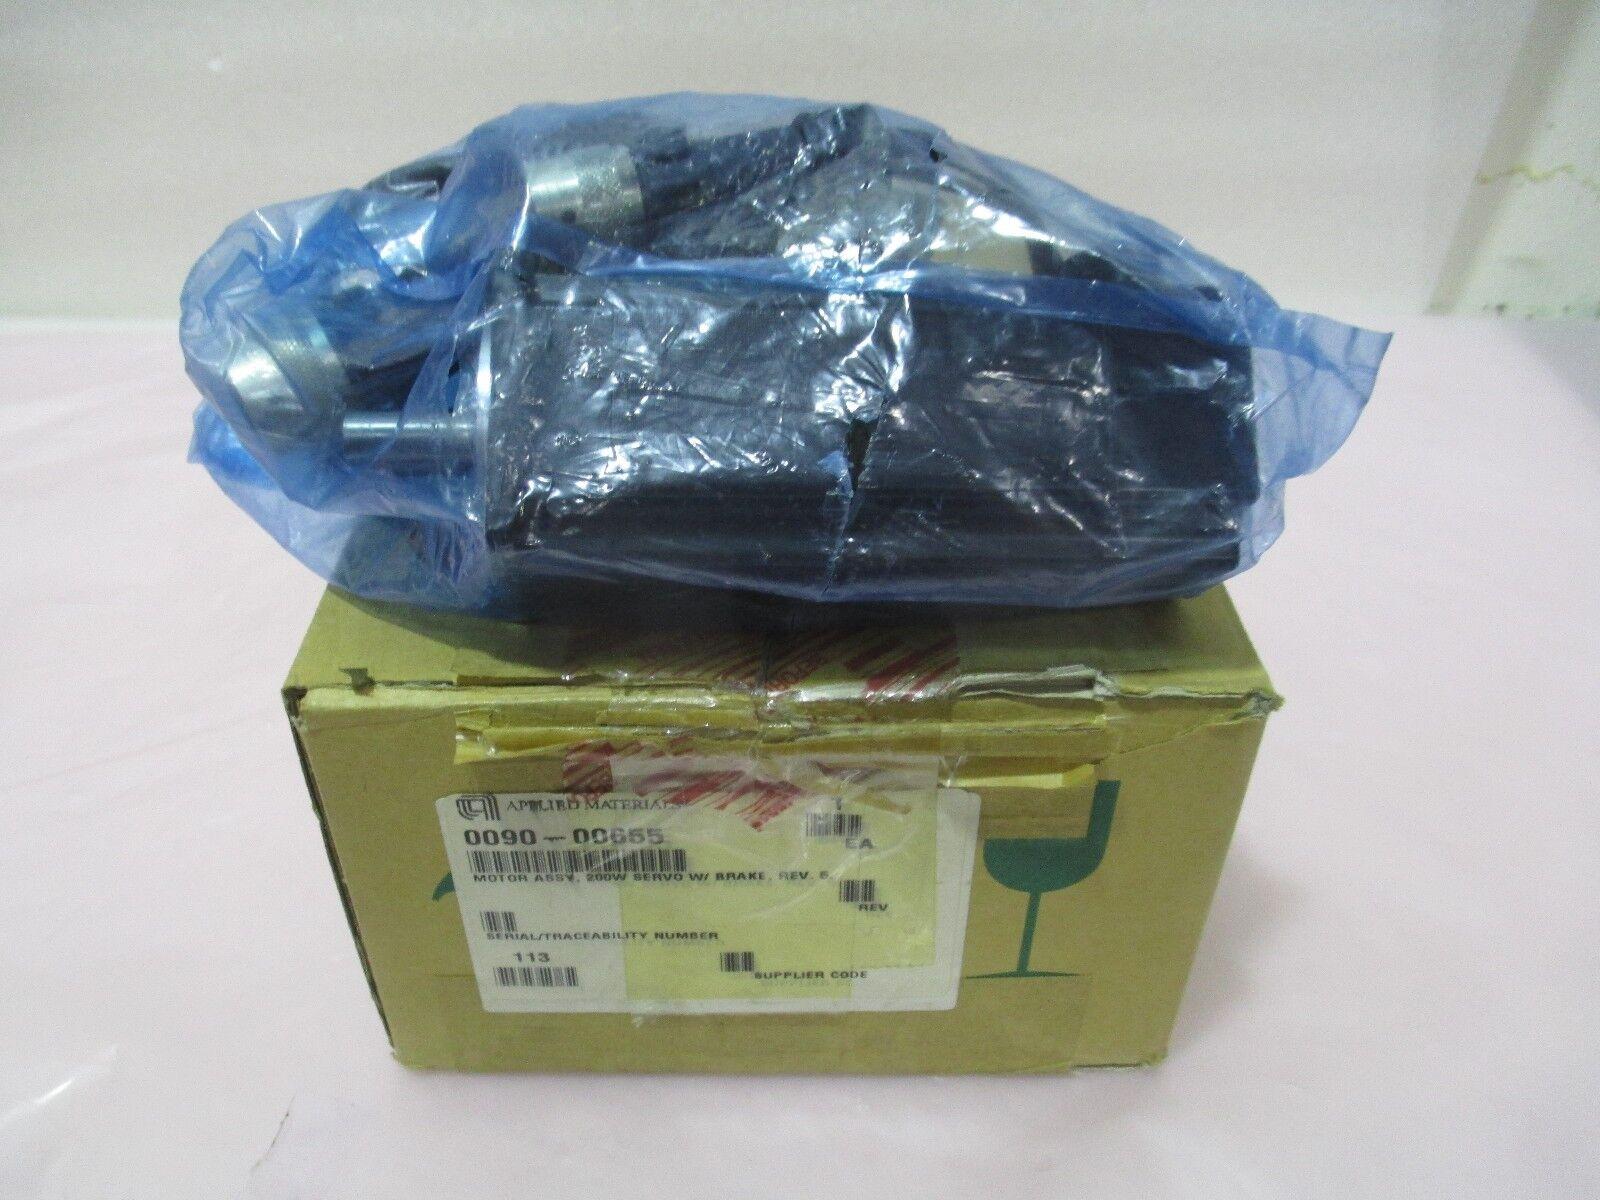 AMAT 0090-00655 Motor Assembly, 200w, Servo W/ Brake, Sanyo Denki, 421896